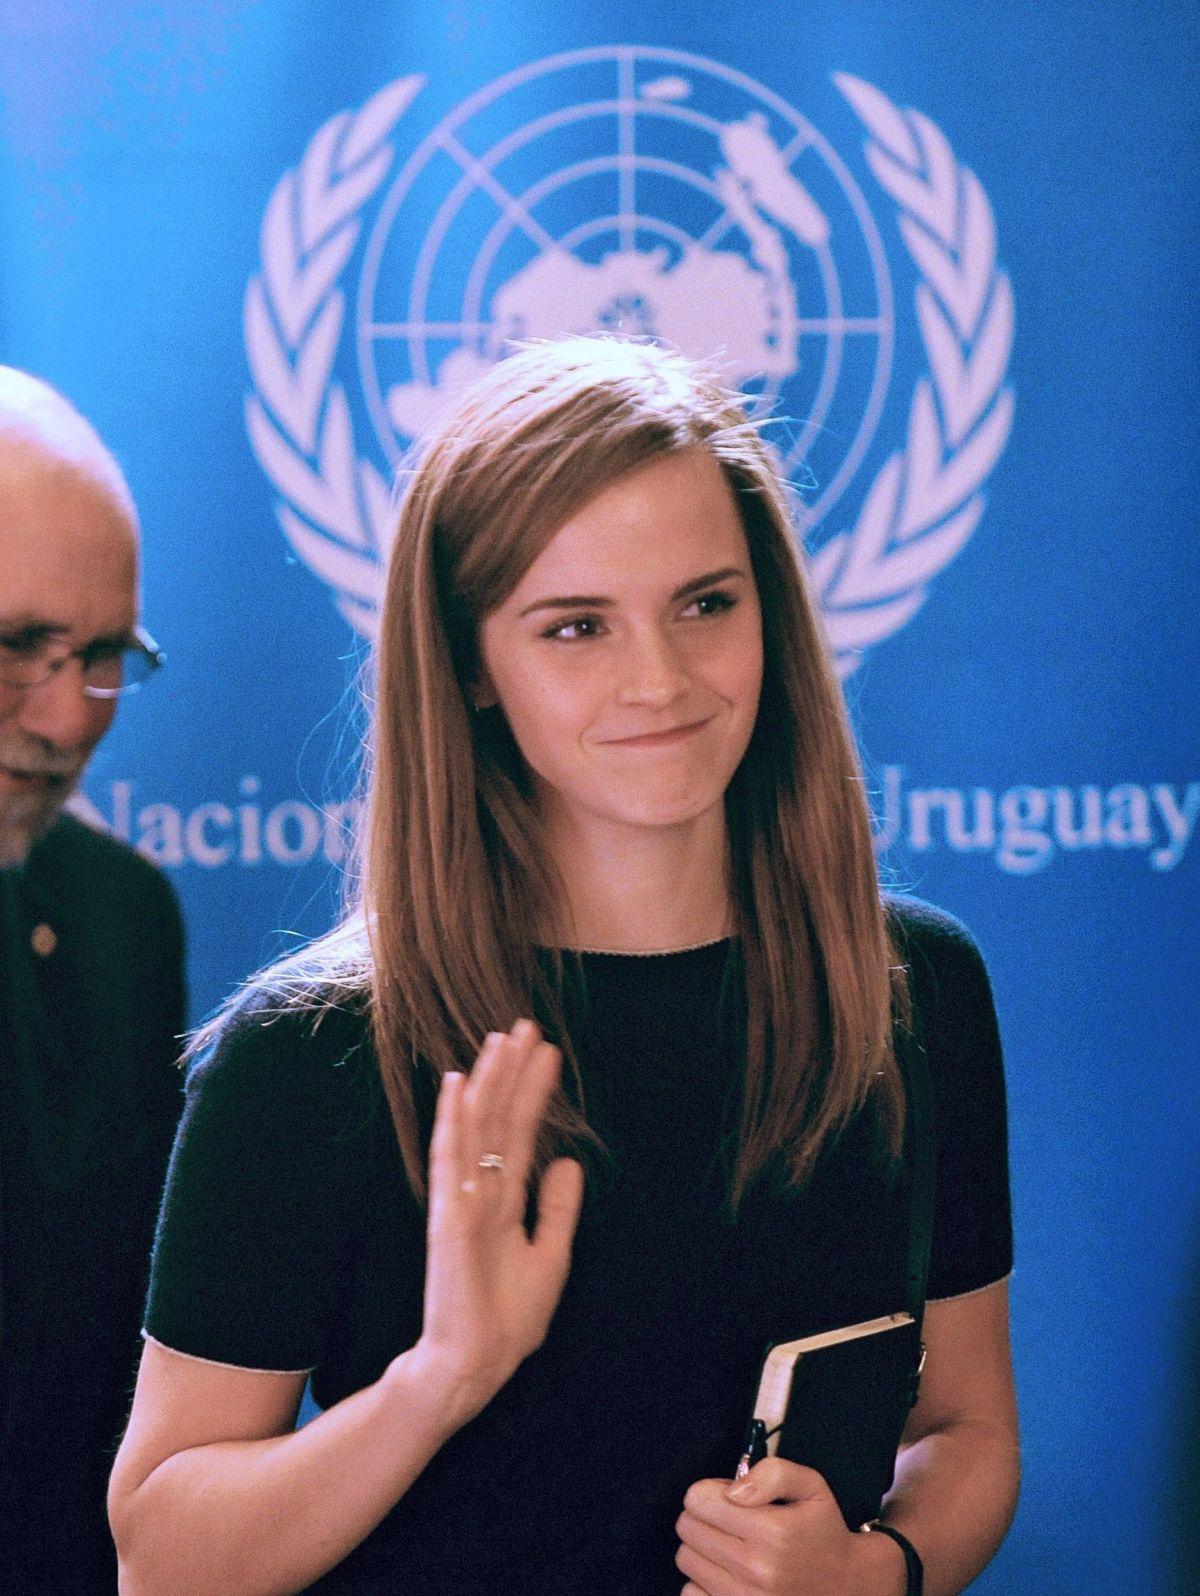 Emma watson at un women event in montevideo uruguay hawtcelebs